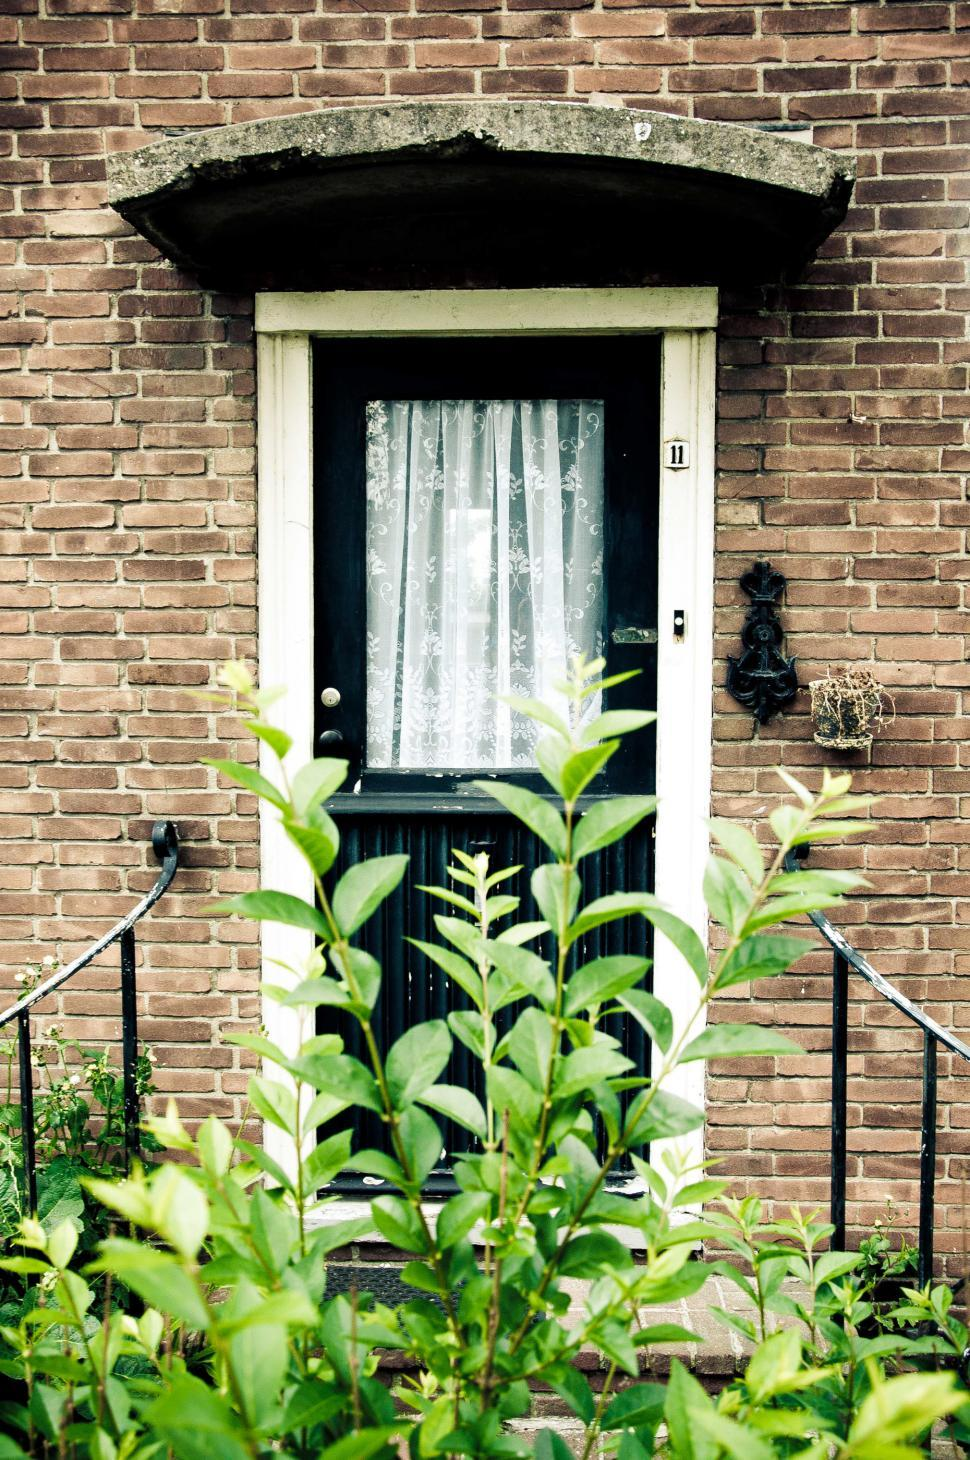 Download Free Stock HD Photo of front door to house Online